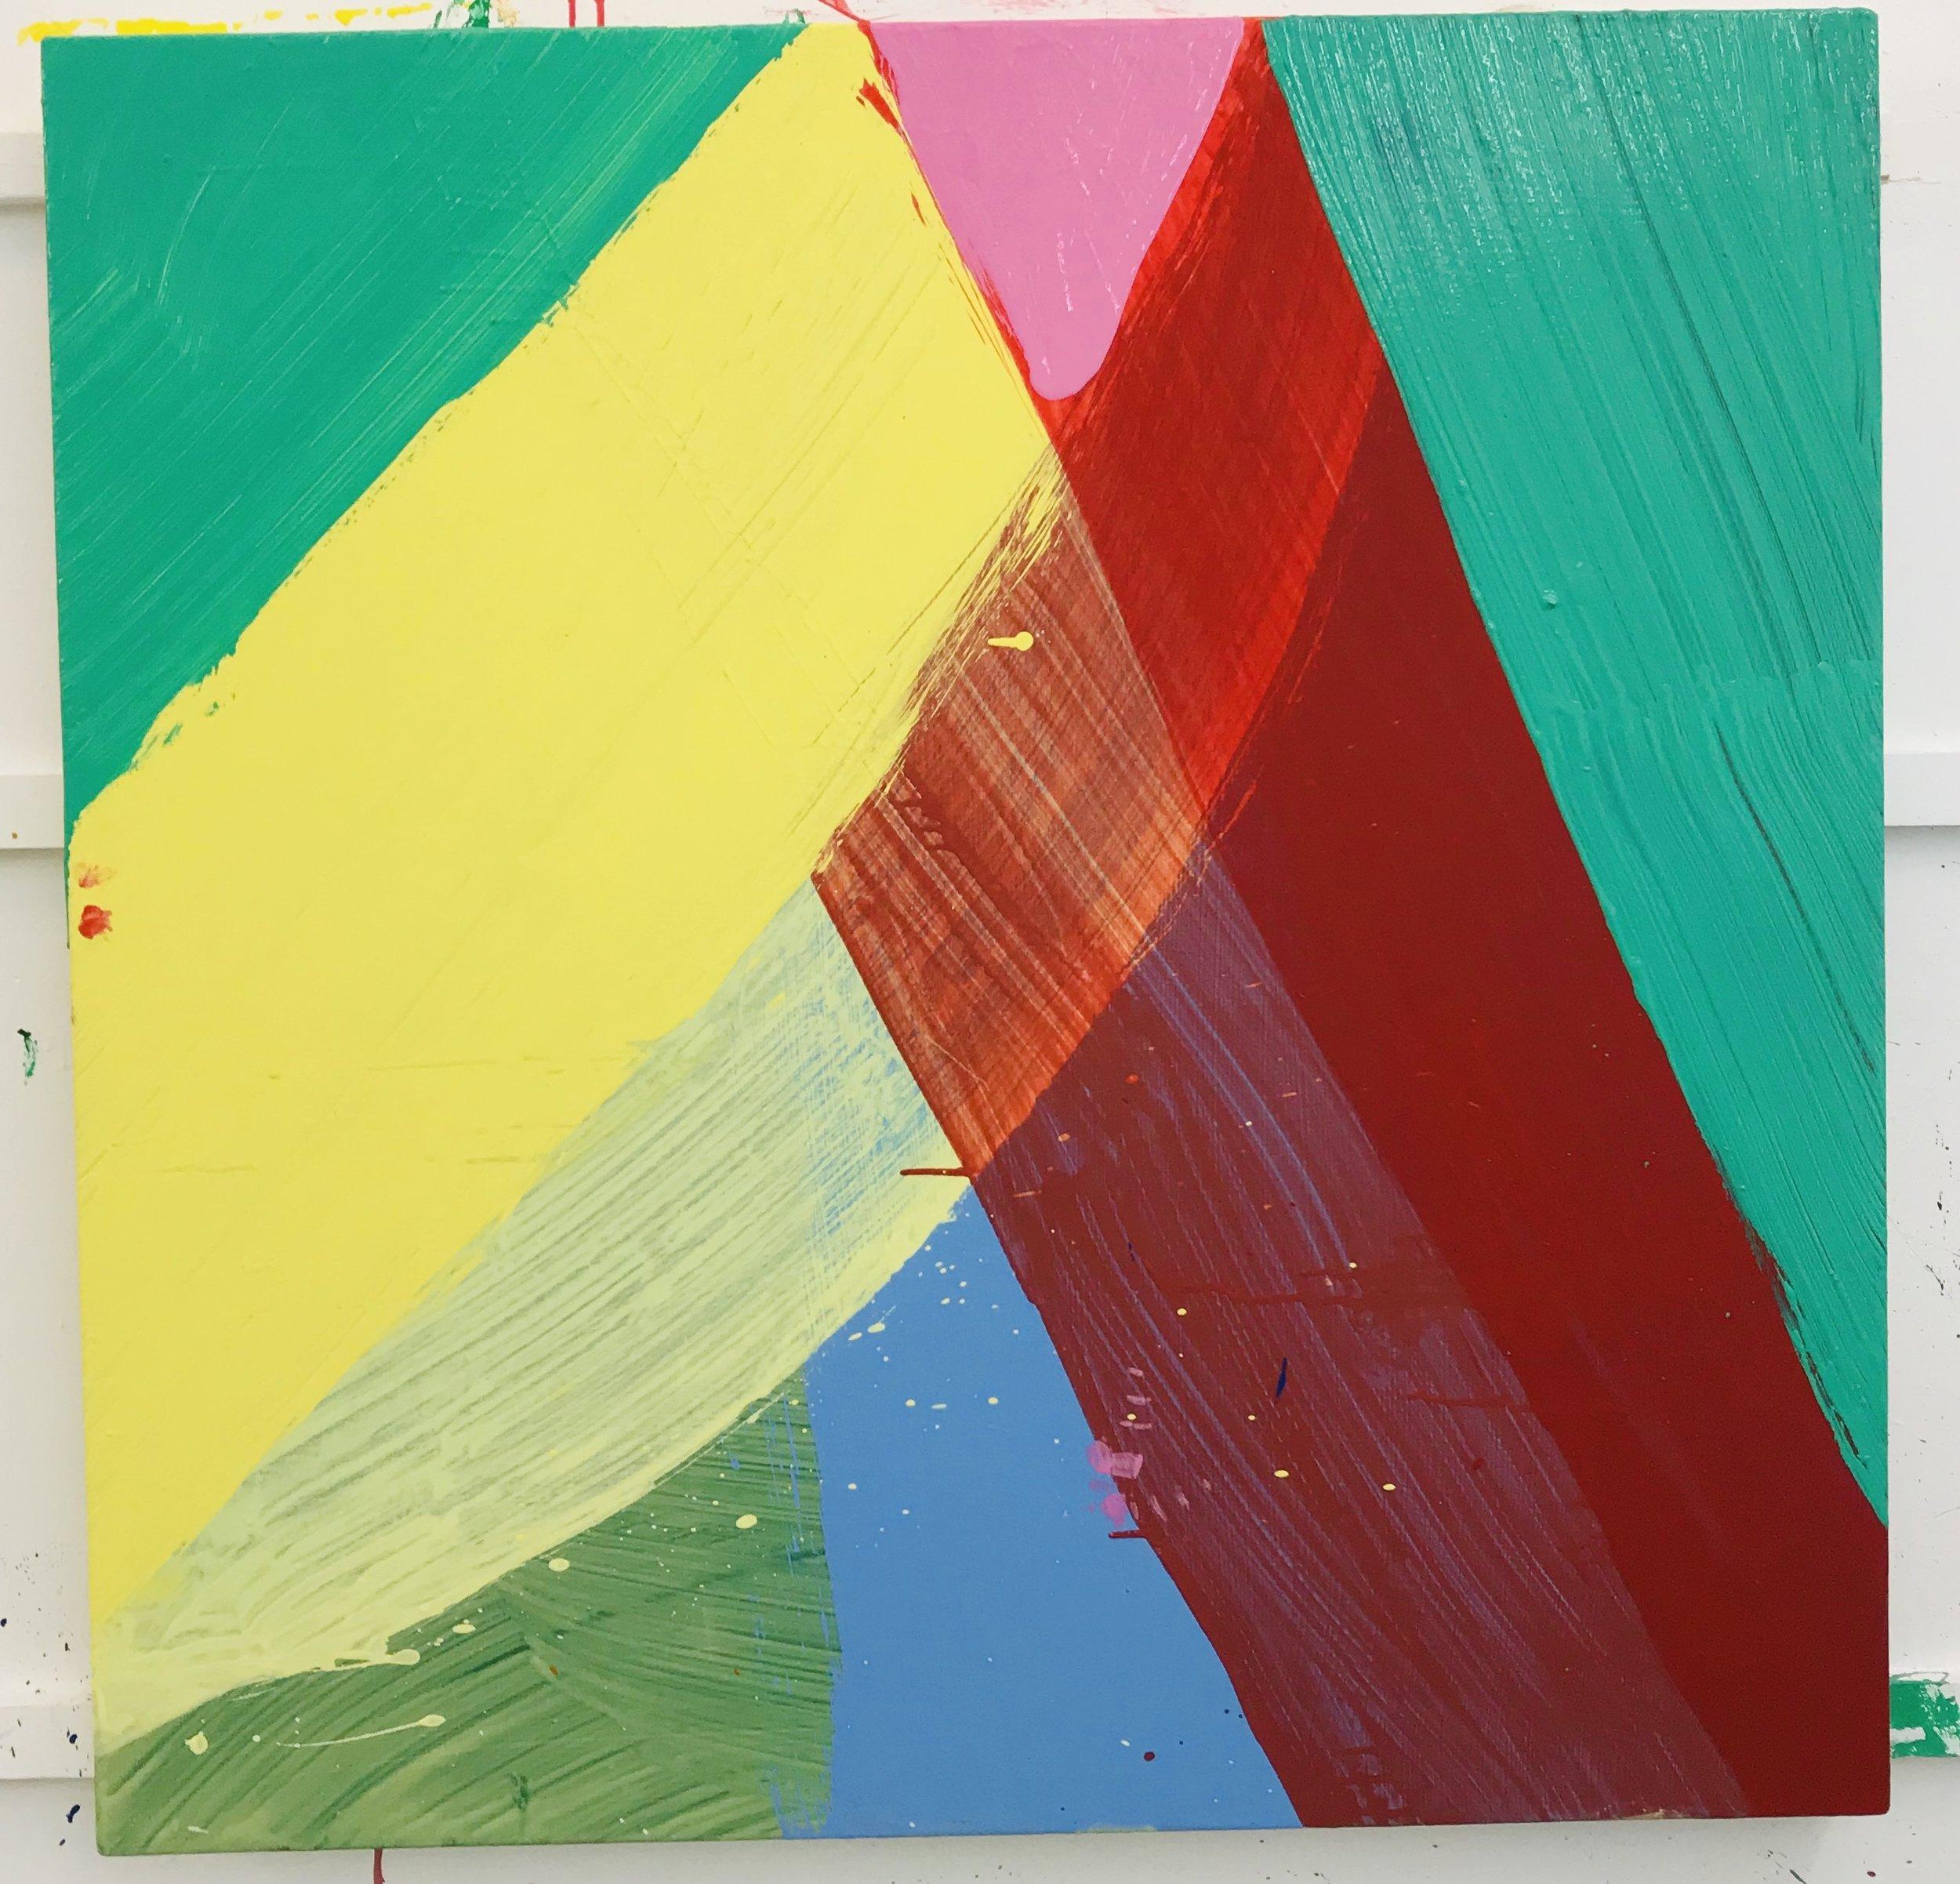 Hartford Art School Galleries_Cat Balco_Open Blue #2_2019_Acrylic on canvas_36%22x36%22_$4,500.jpg